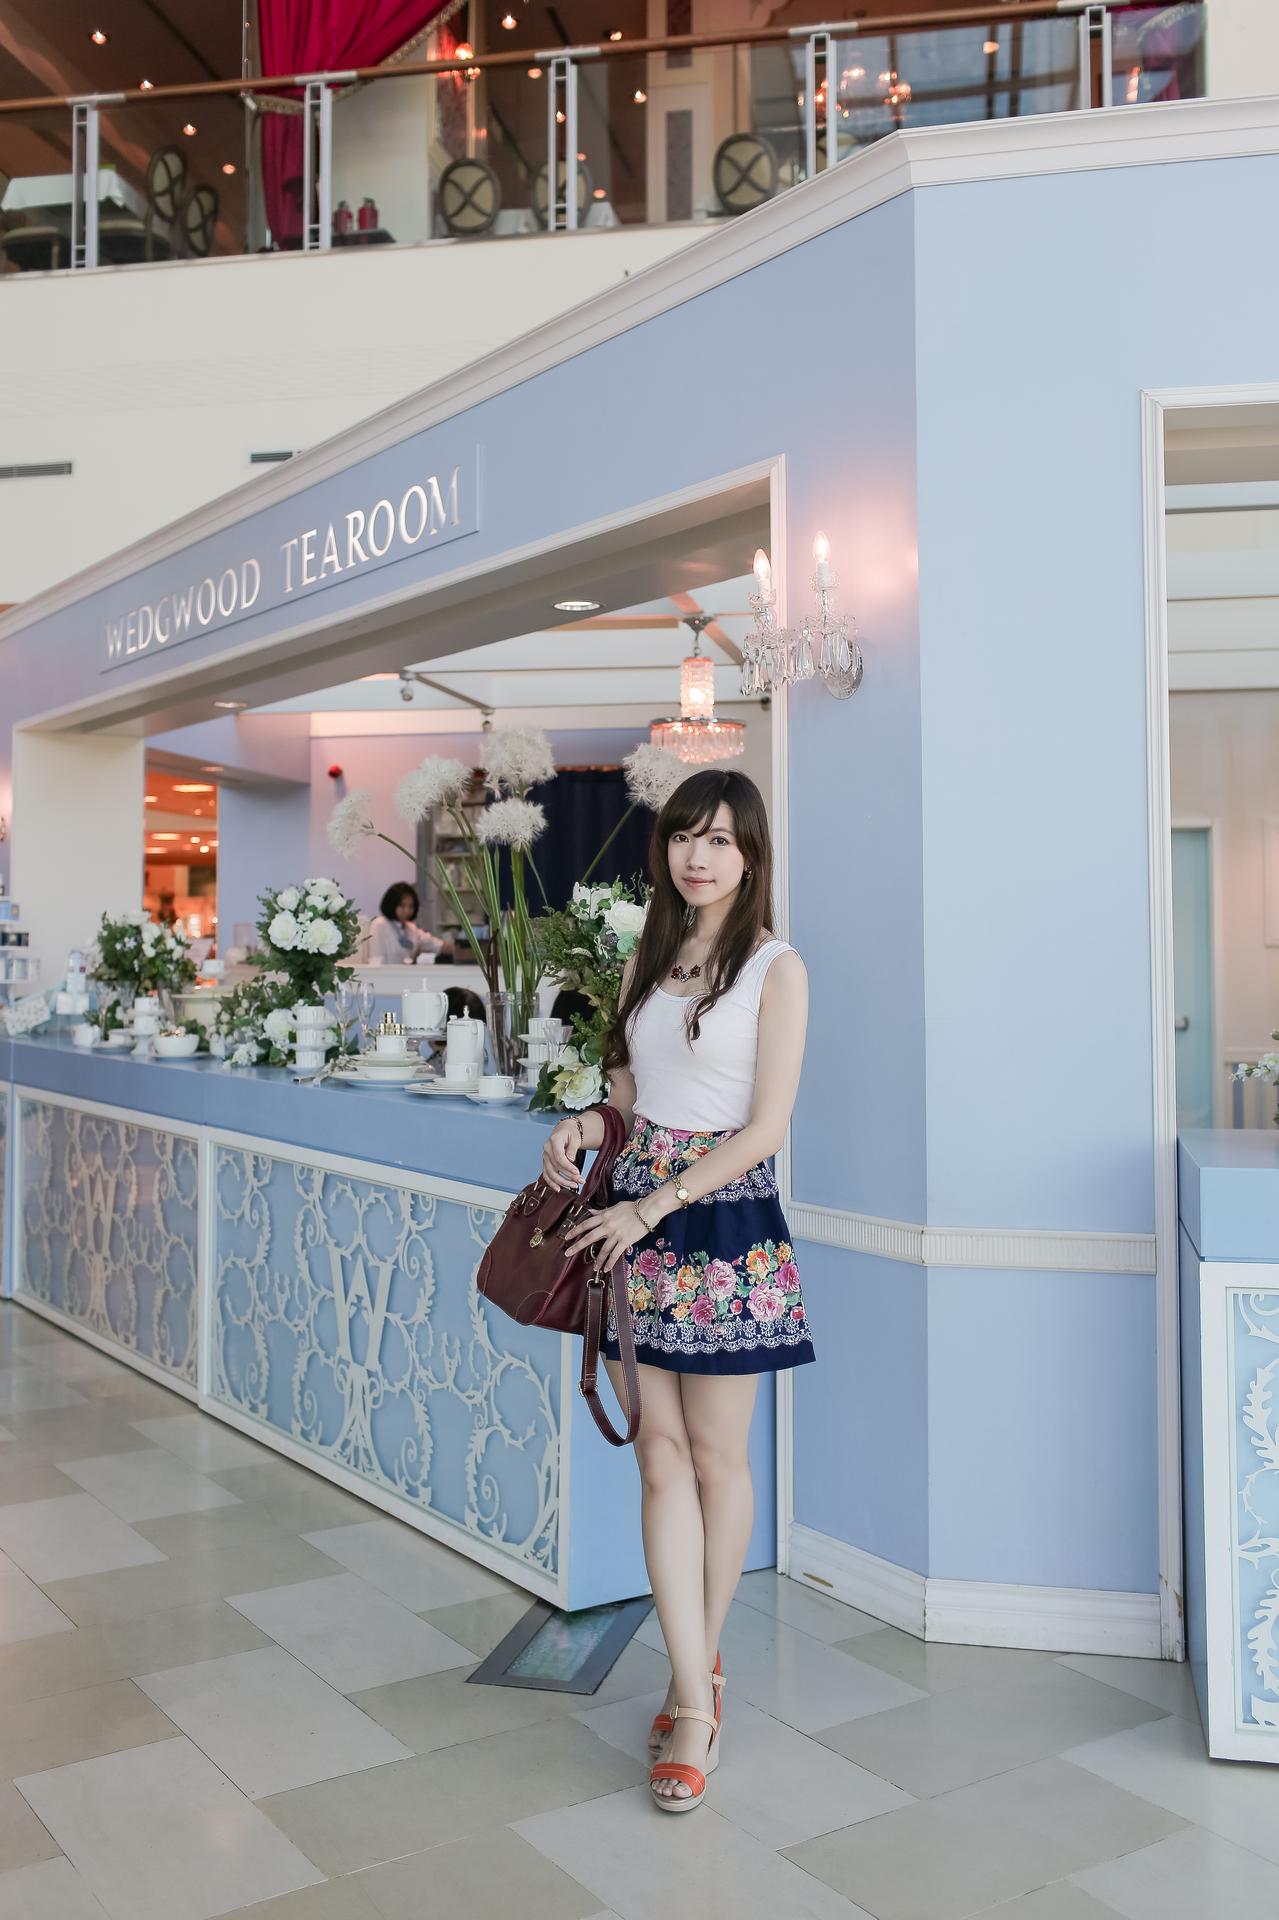 [Wedgwood Tearoom] 大吉嶺、野餐茶、楓糖鬆餅 and Picnicking Skirt again~XD